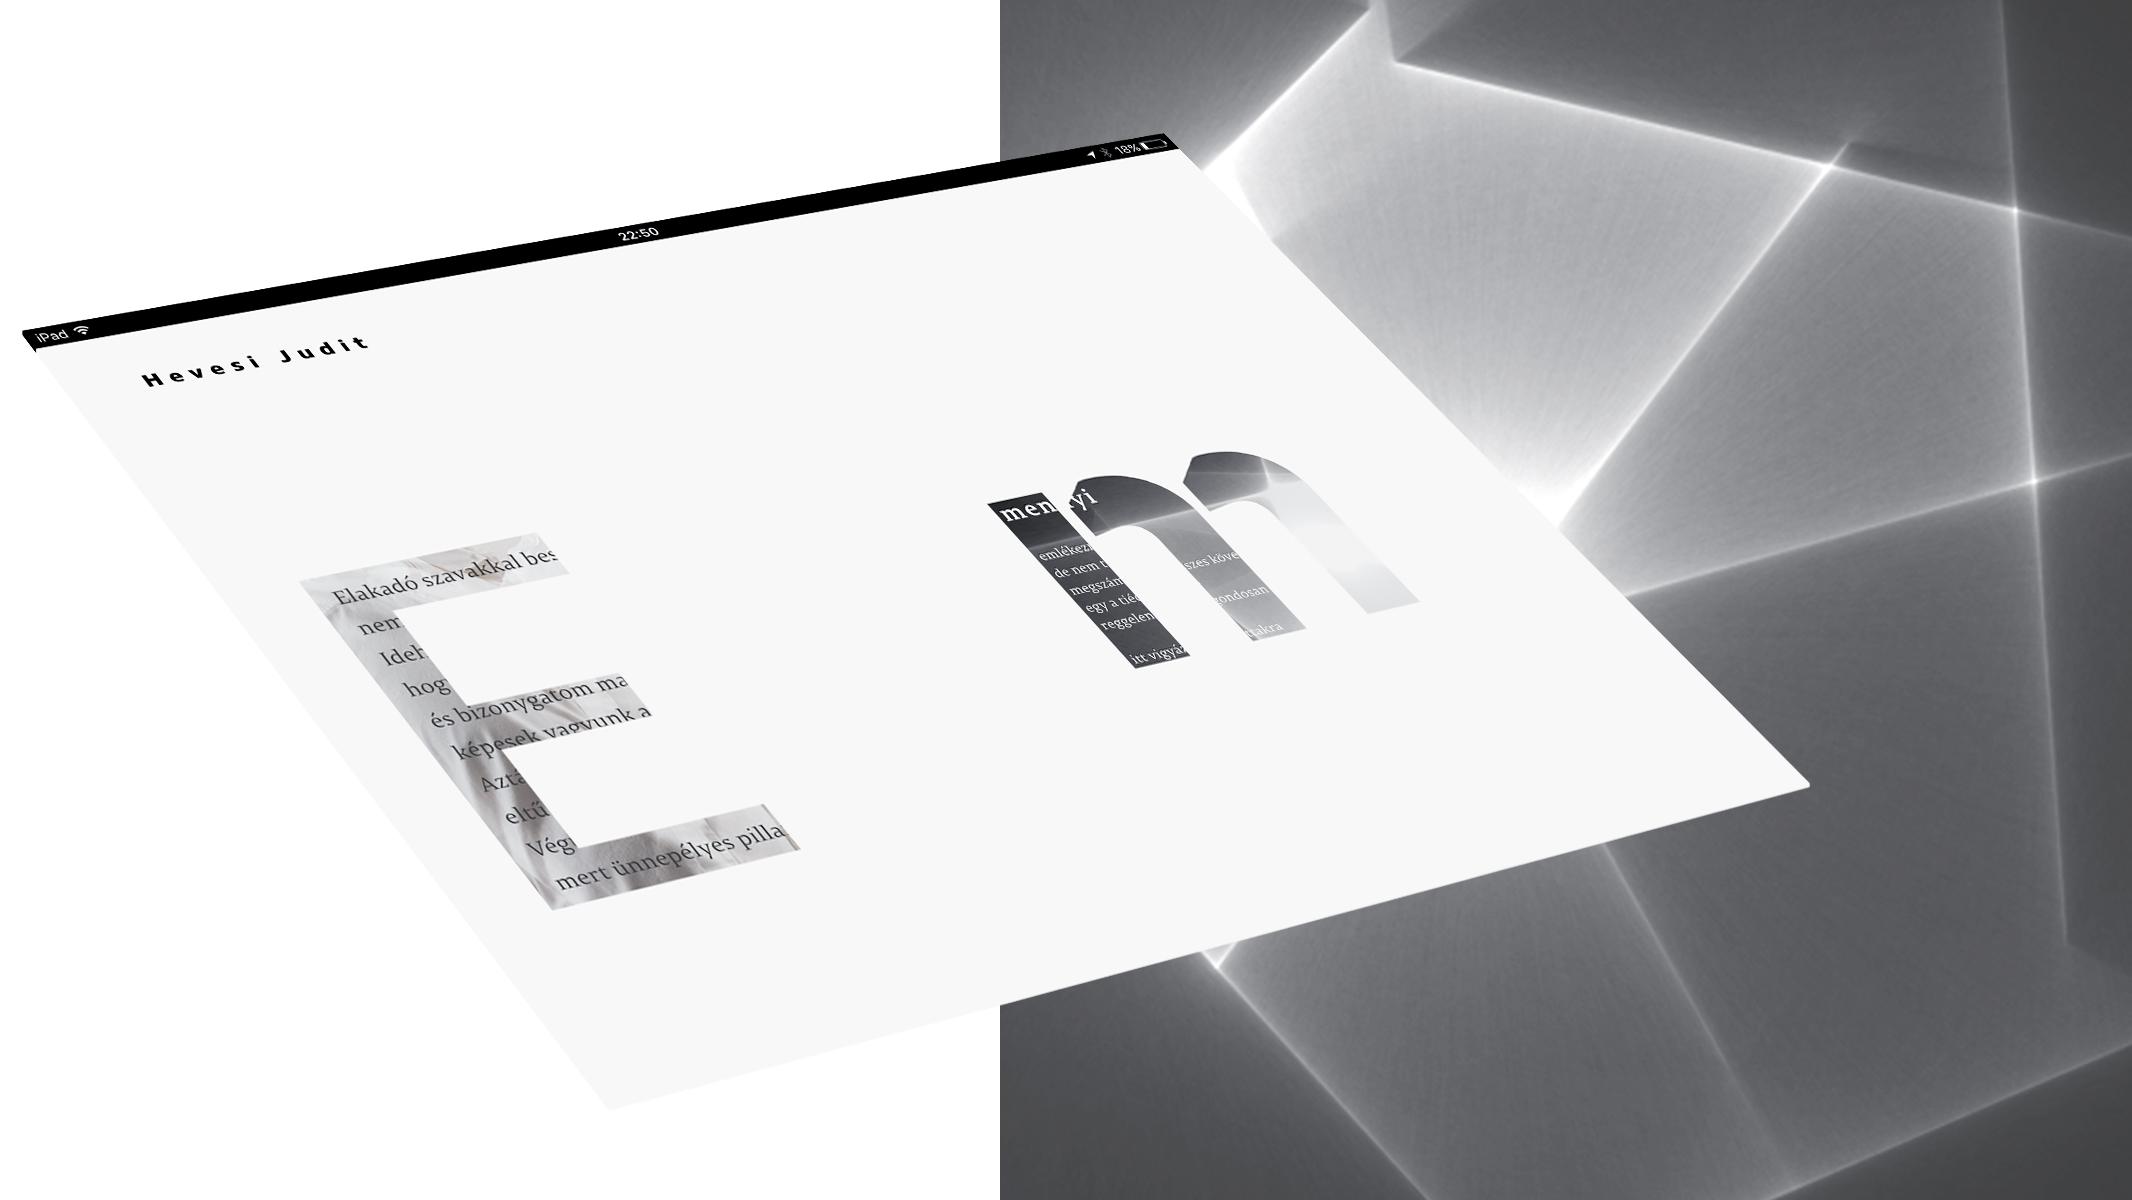 emlekek-tava-2132x1200-018